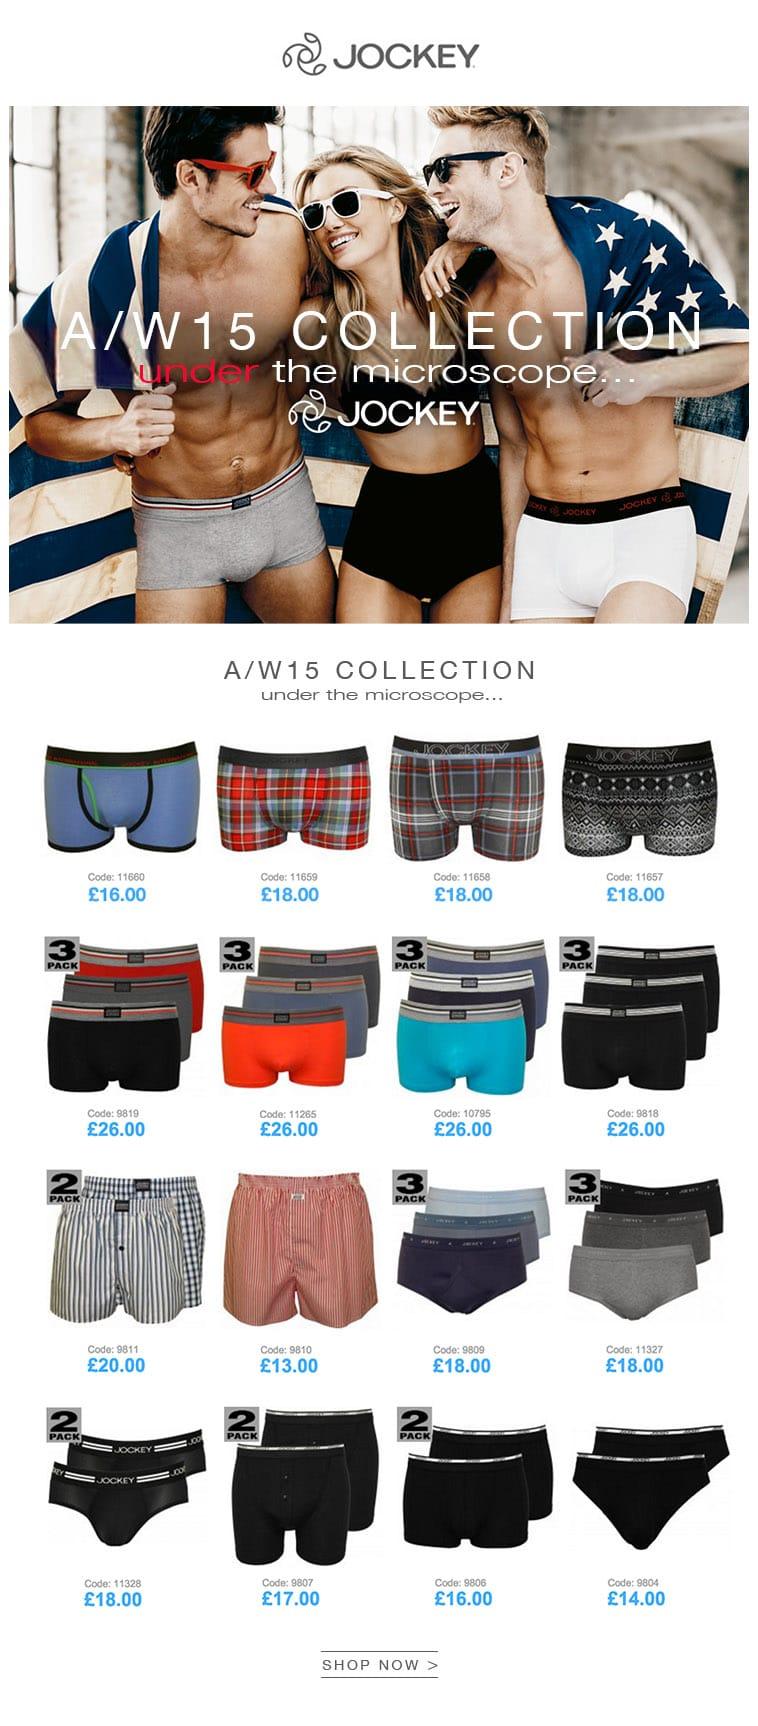 Jockey underwear & Jockey Boxer AW15 collection | UnderU